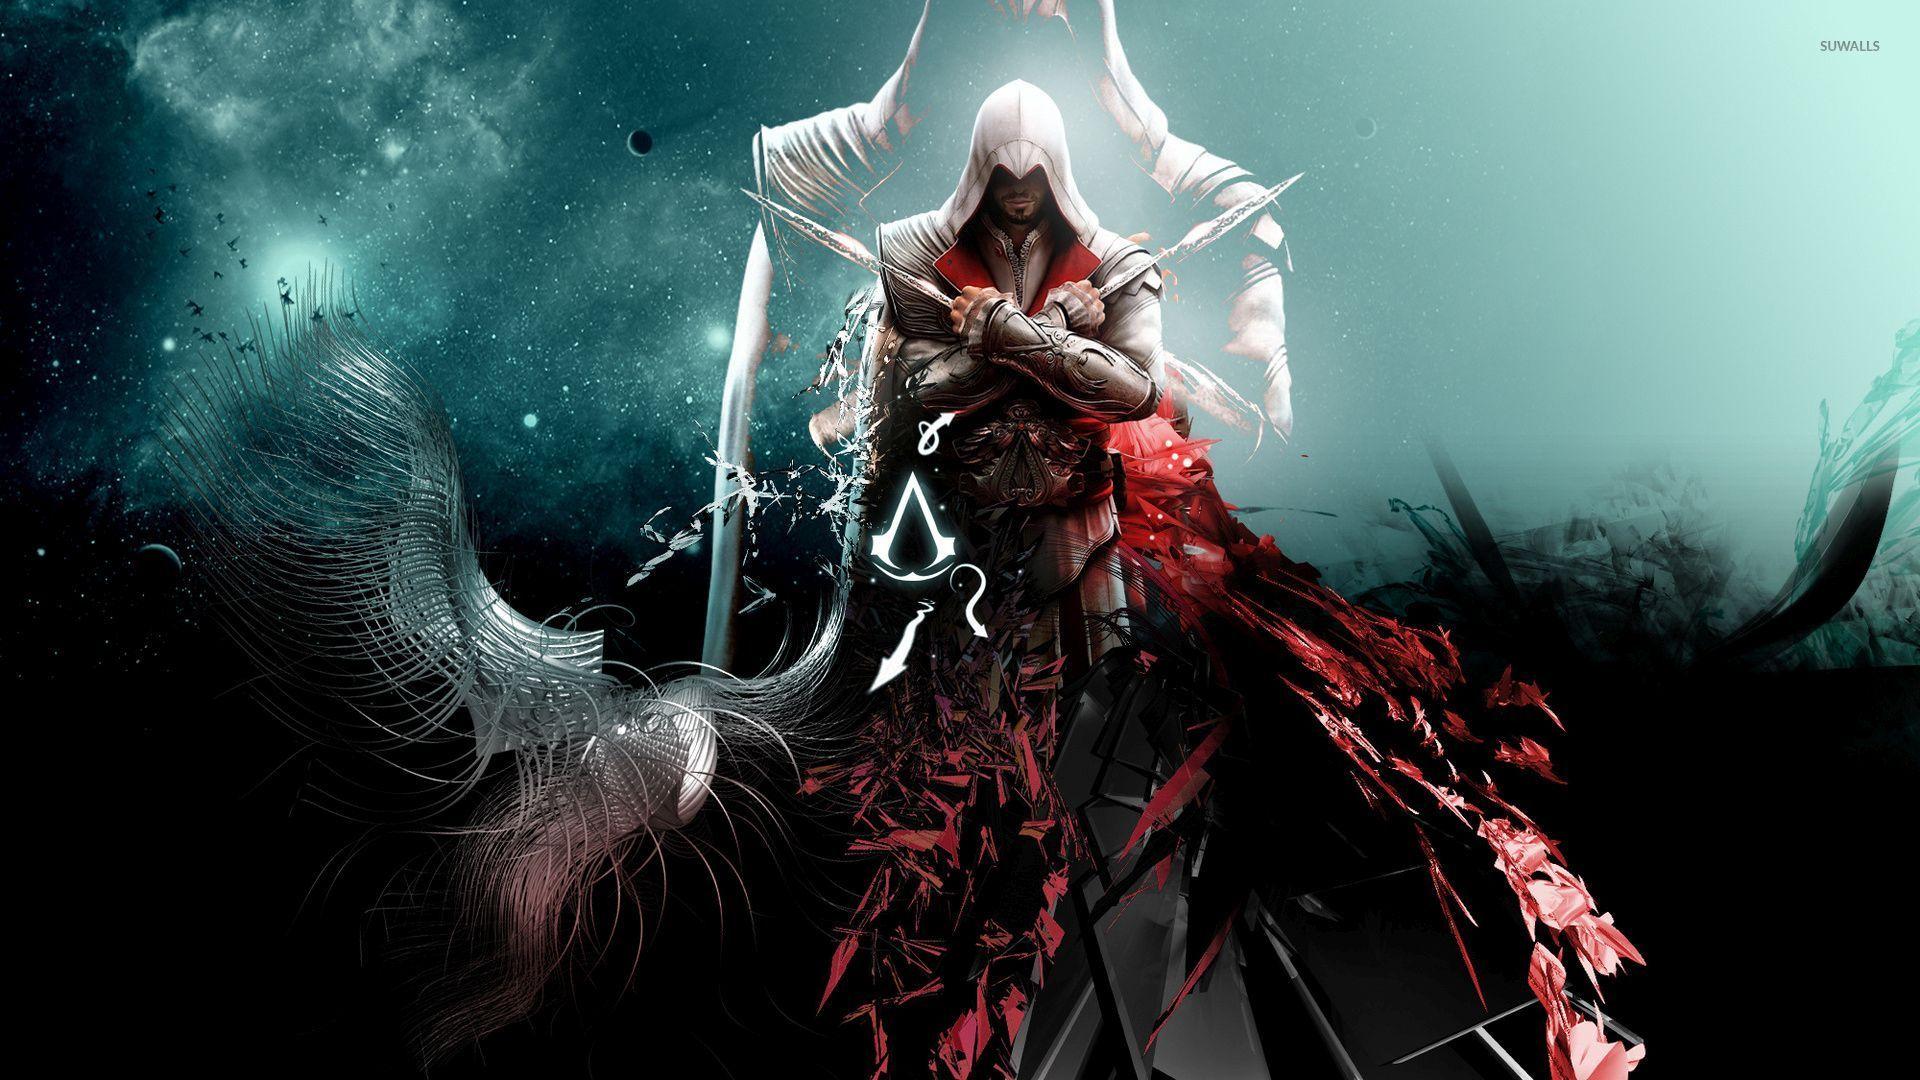 Ezio Auditore Da Firenze Assassins Creed Wallpaper 2k